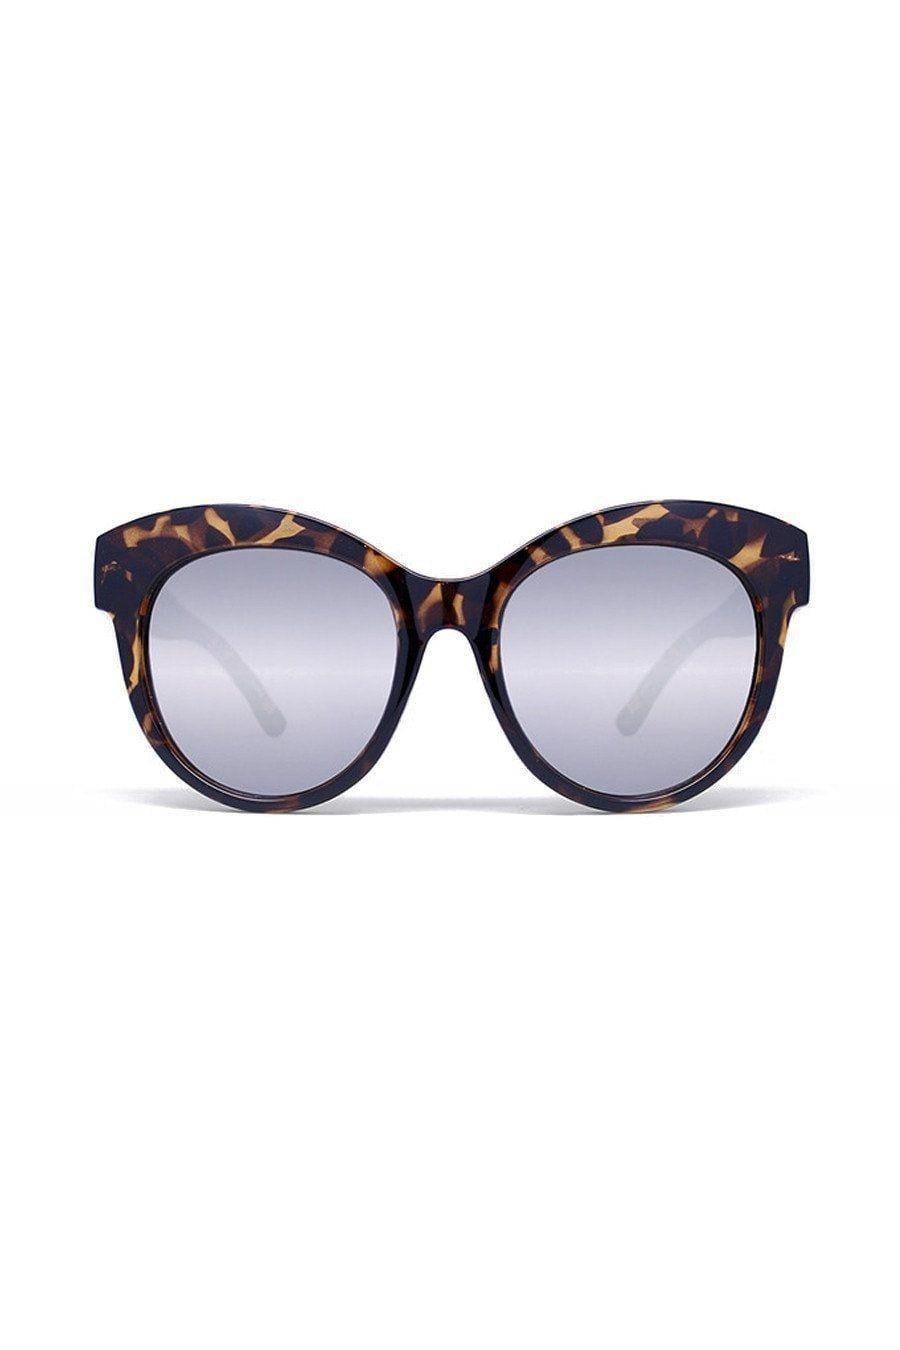 e9b15de4f8376 Quay Australia MAIDEN Tortoise Oversize Designer Sunglasses